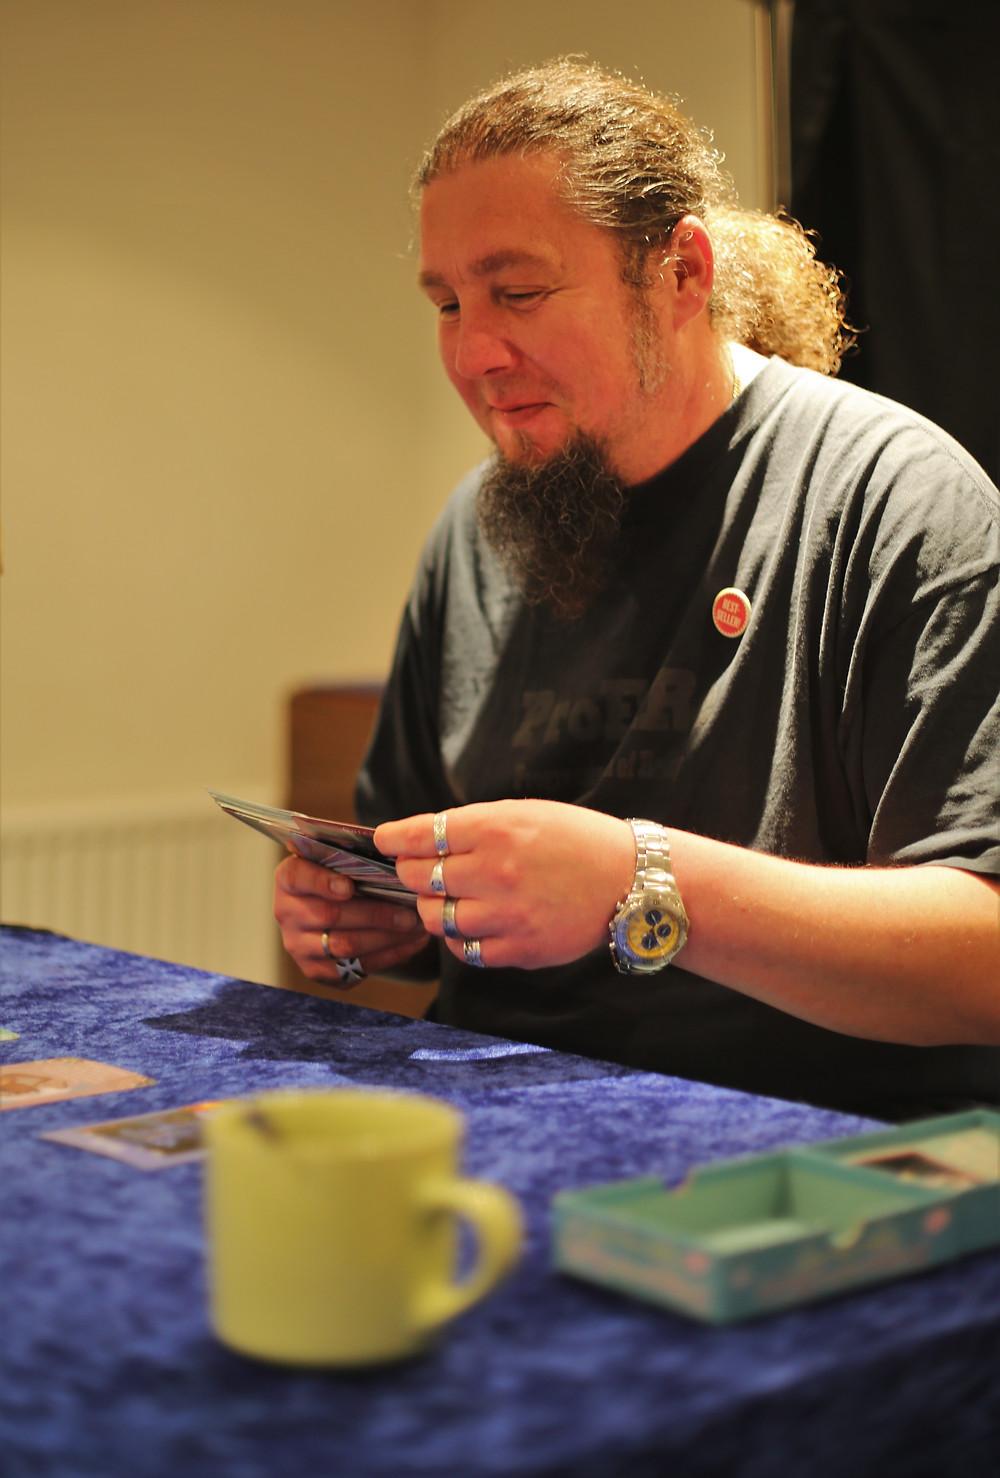 Tea & Tarot session at Shining Light, Edinburgh